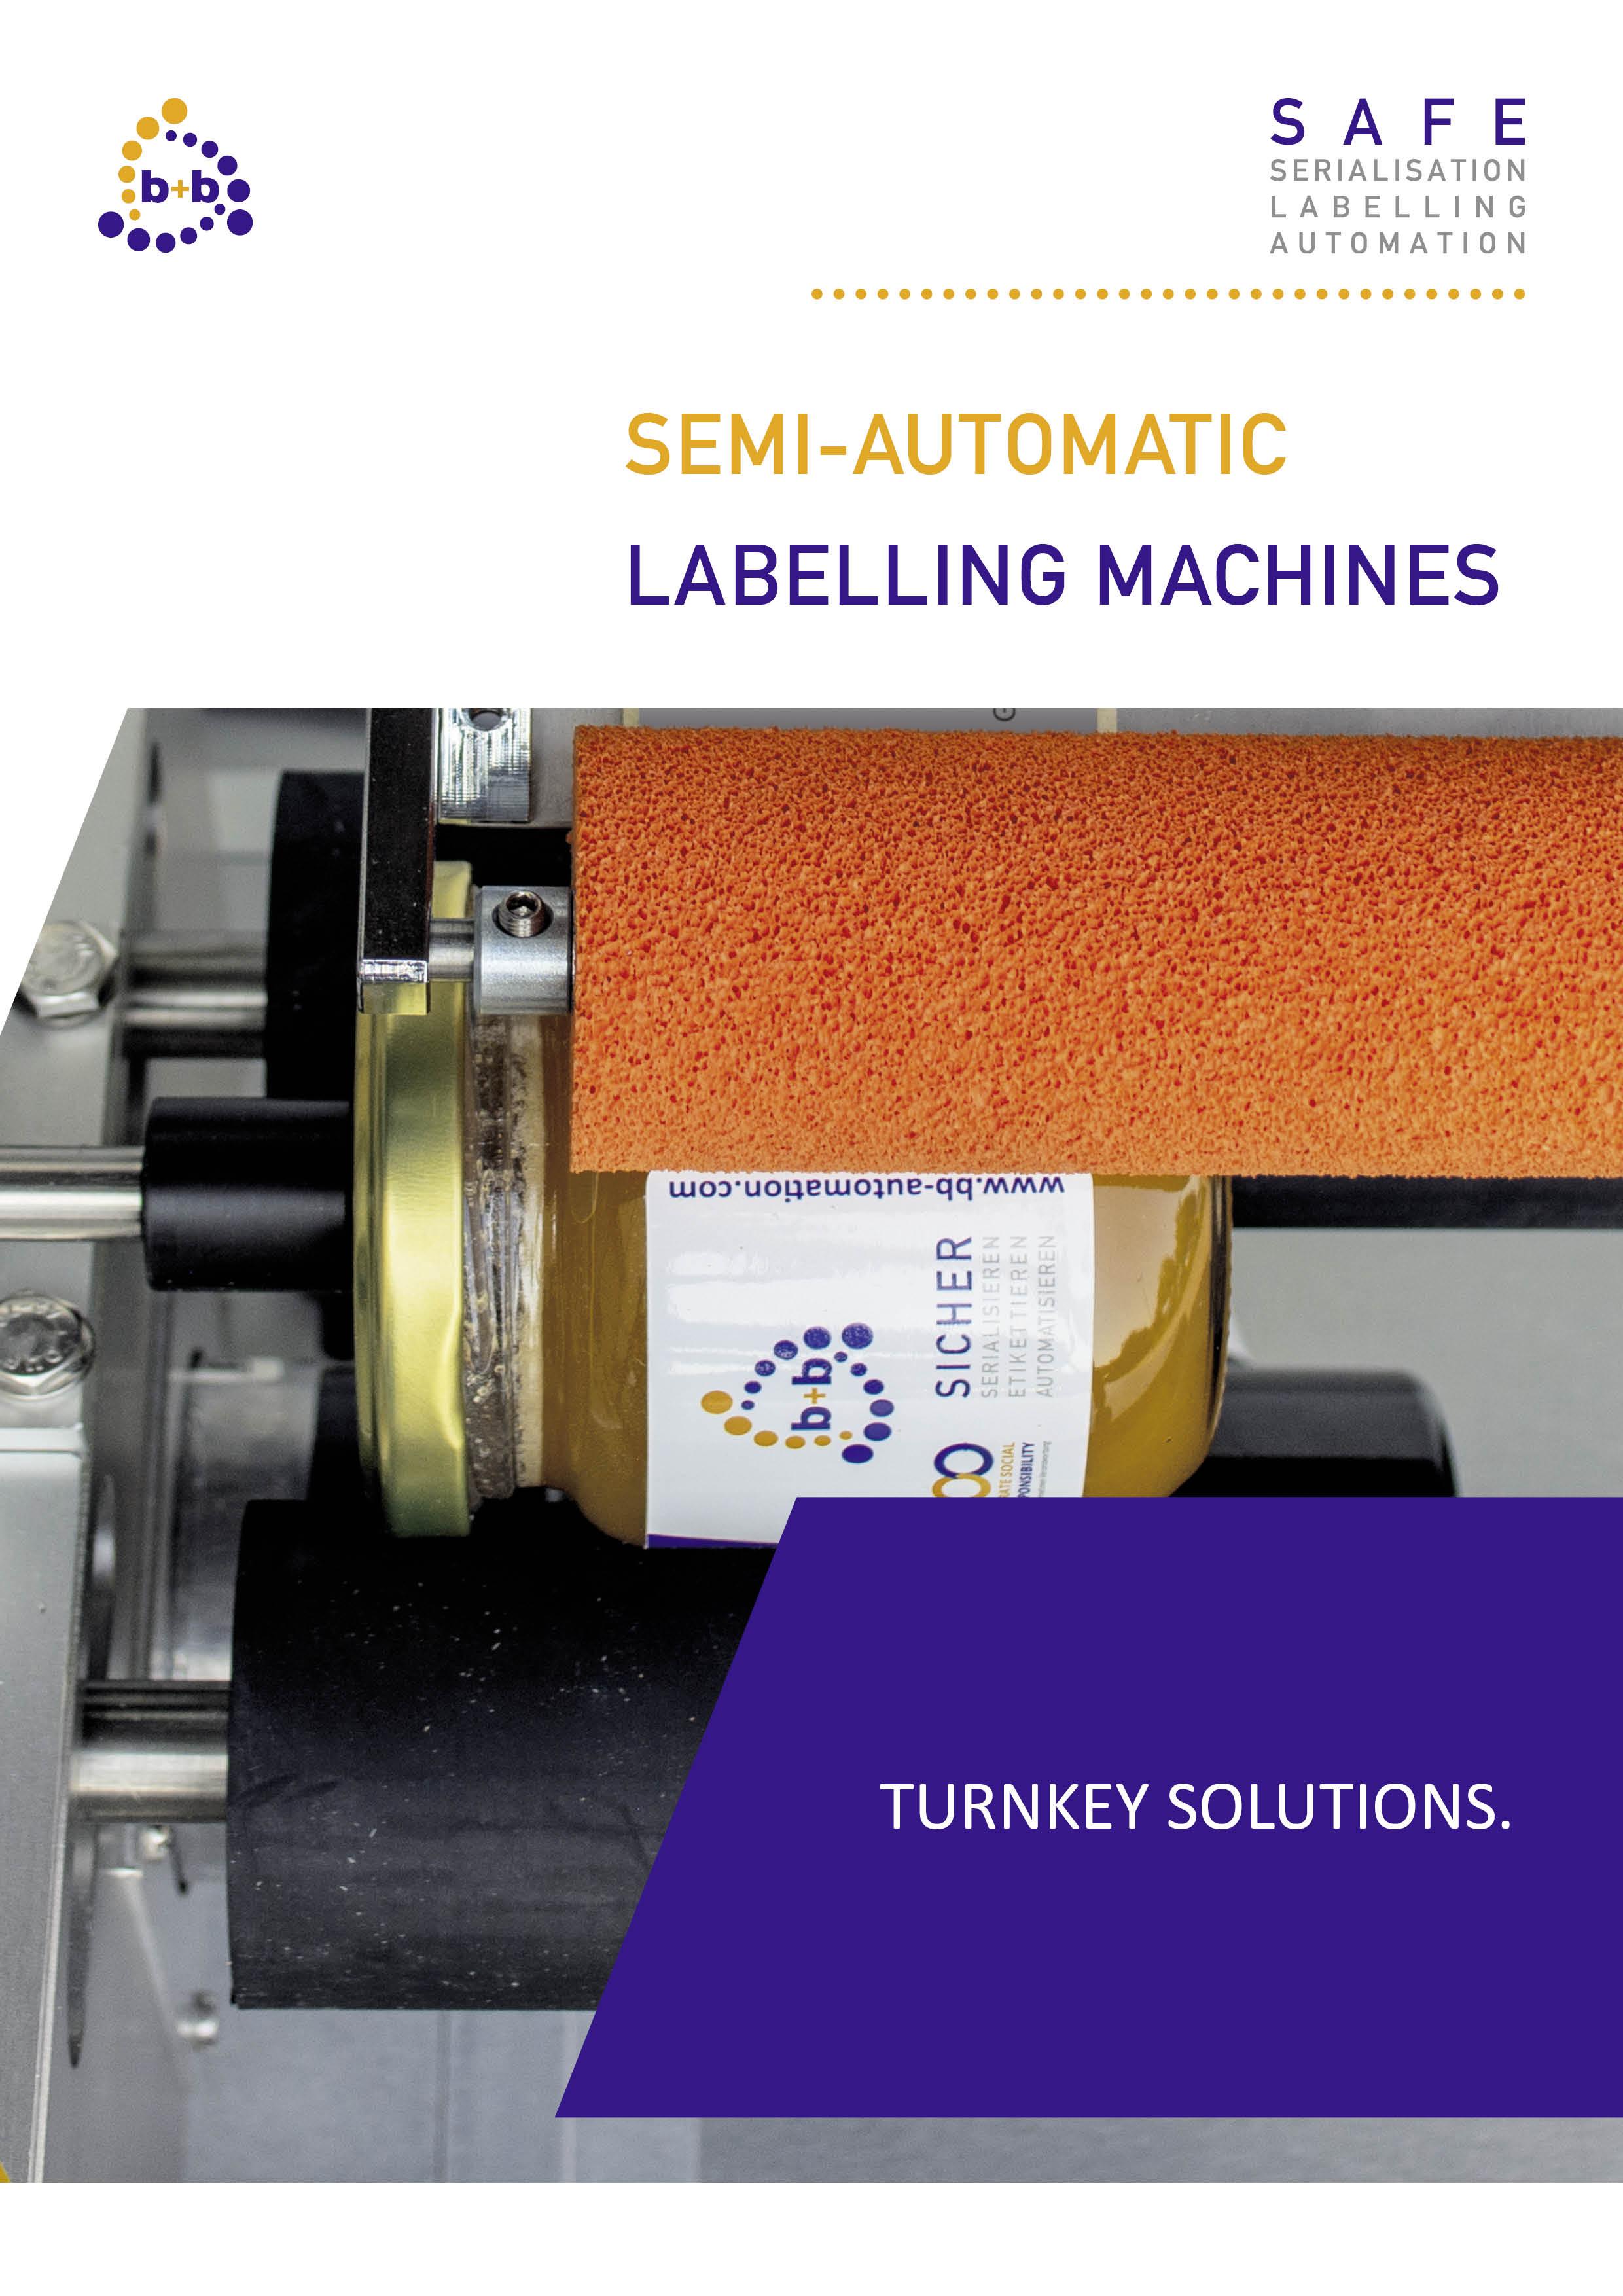 Semi-automatic labelling machines